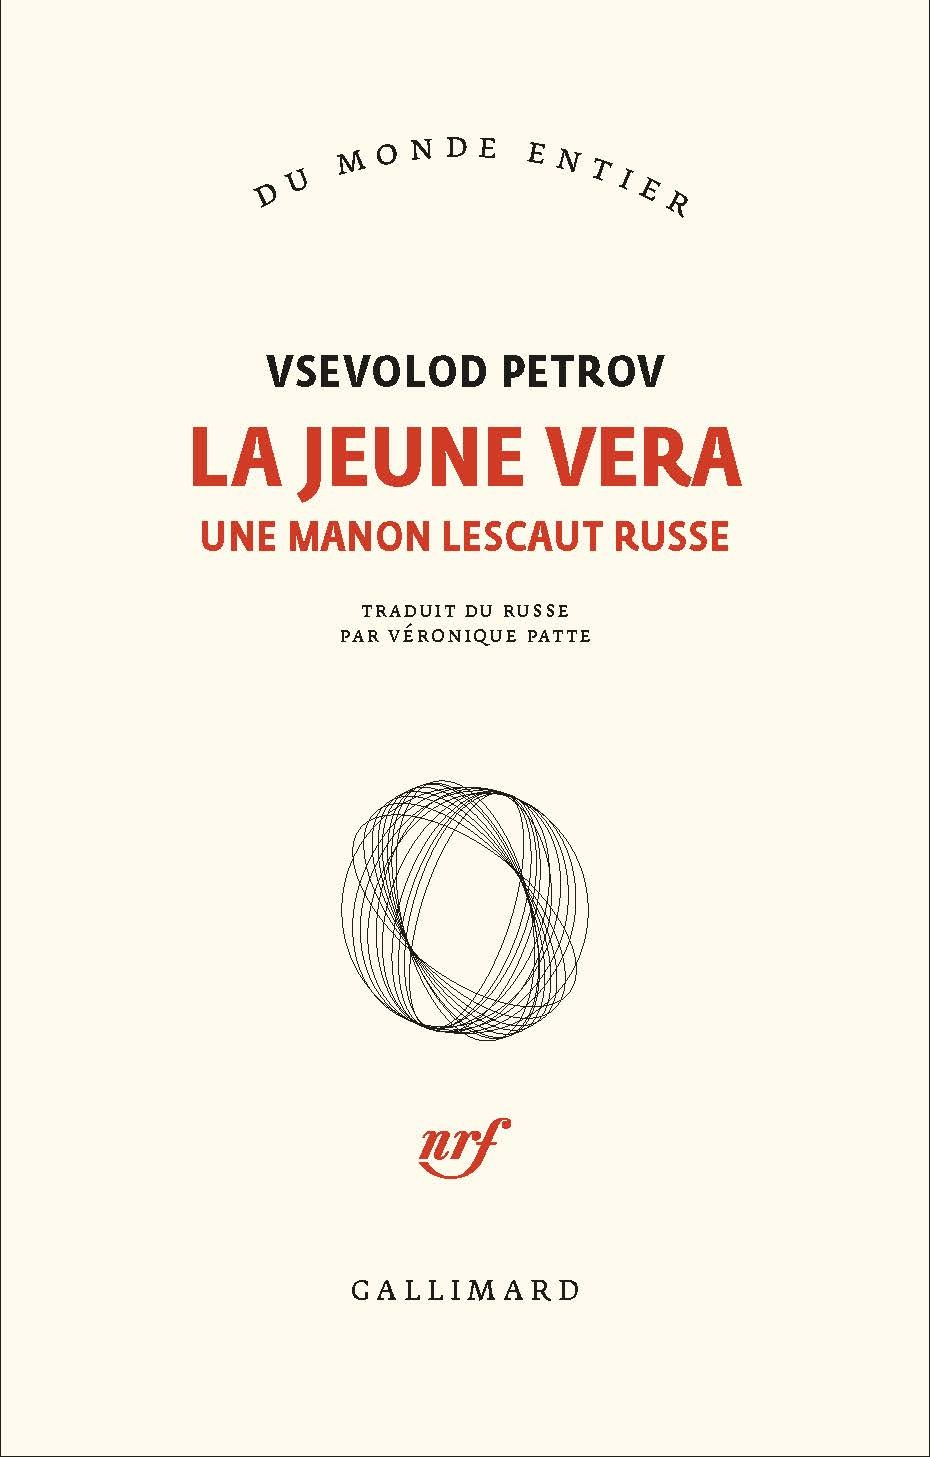 LA JEUNE VERA - UNE MANON LESCAUT RUSSE